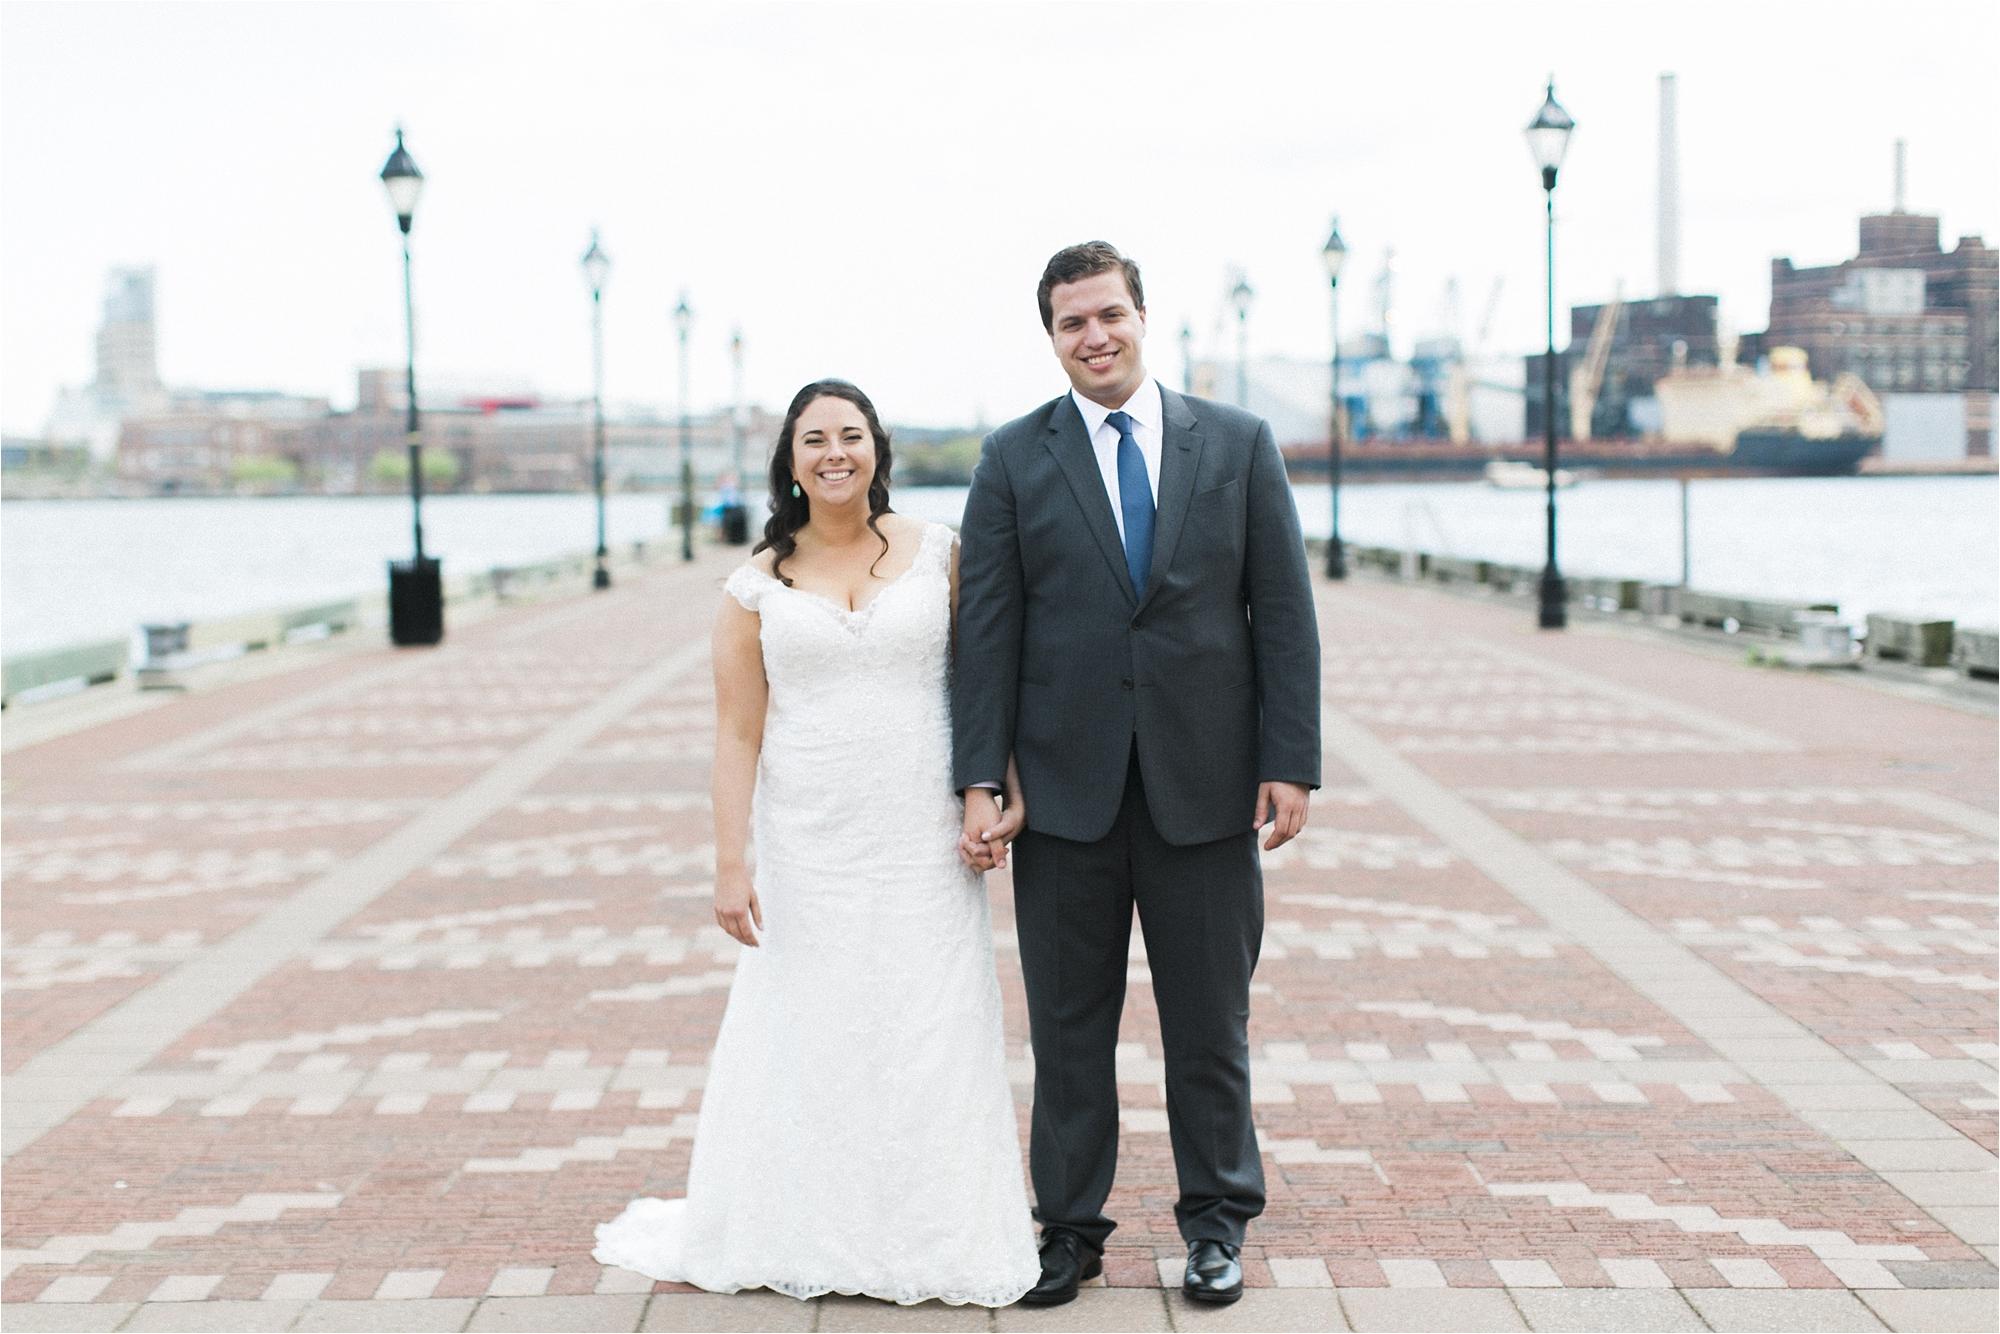 tom-jill-baltimore-maryland-industrial-elegant-wedding-015.JPG